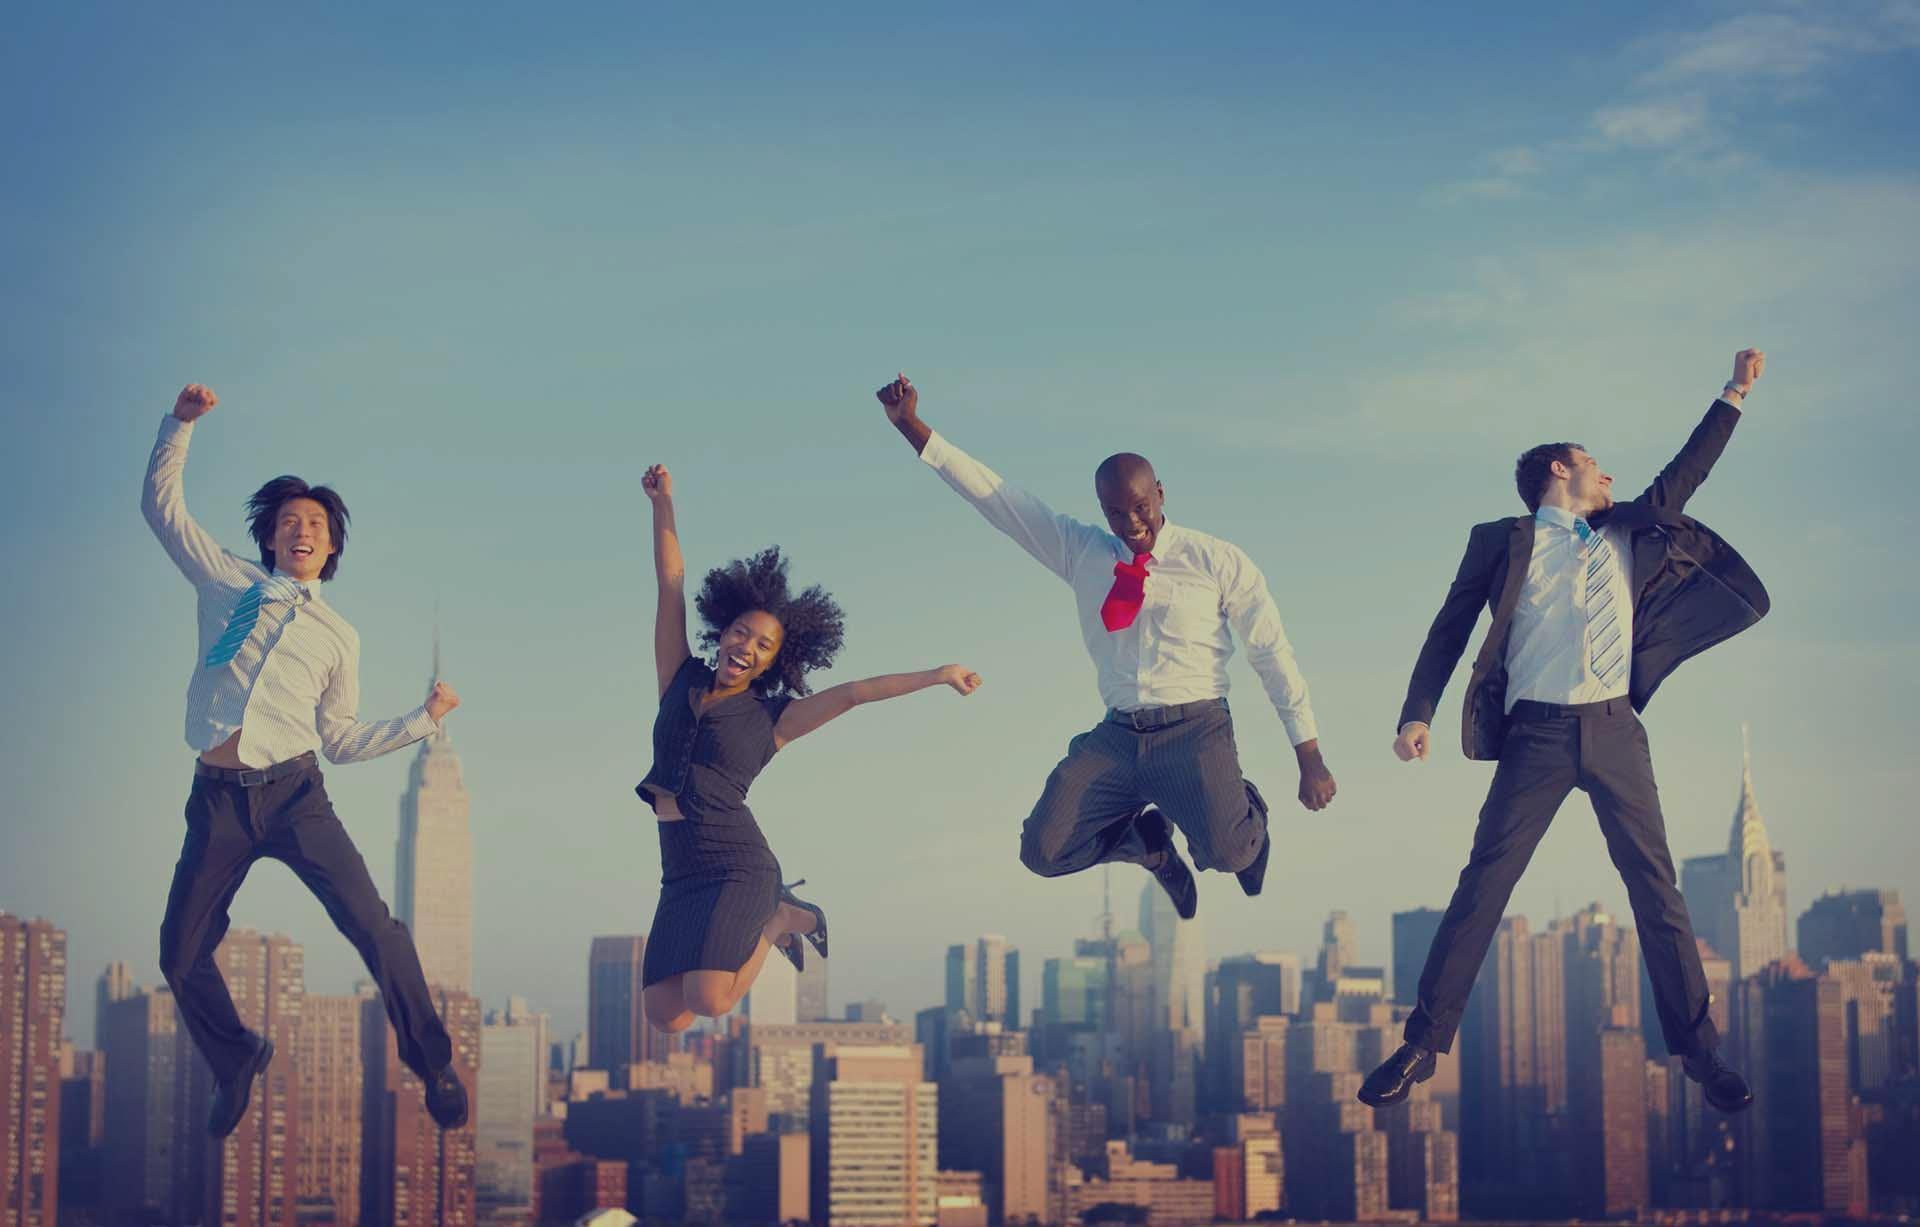 staffing agencies, staffing agencies millennials, temp staffing agencies